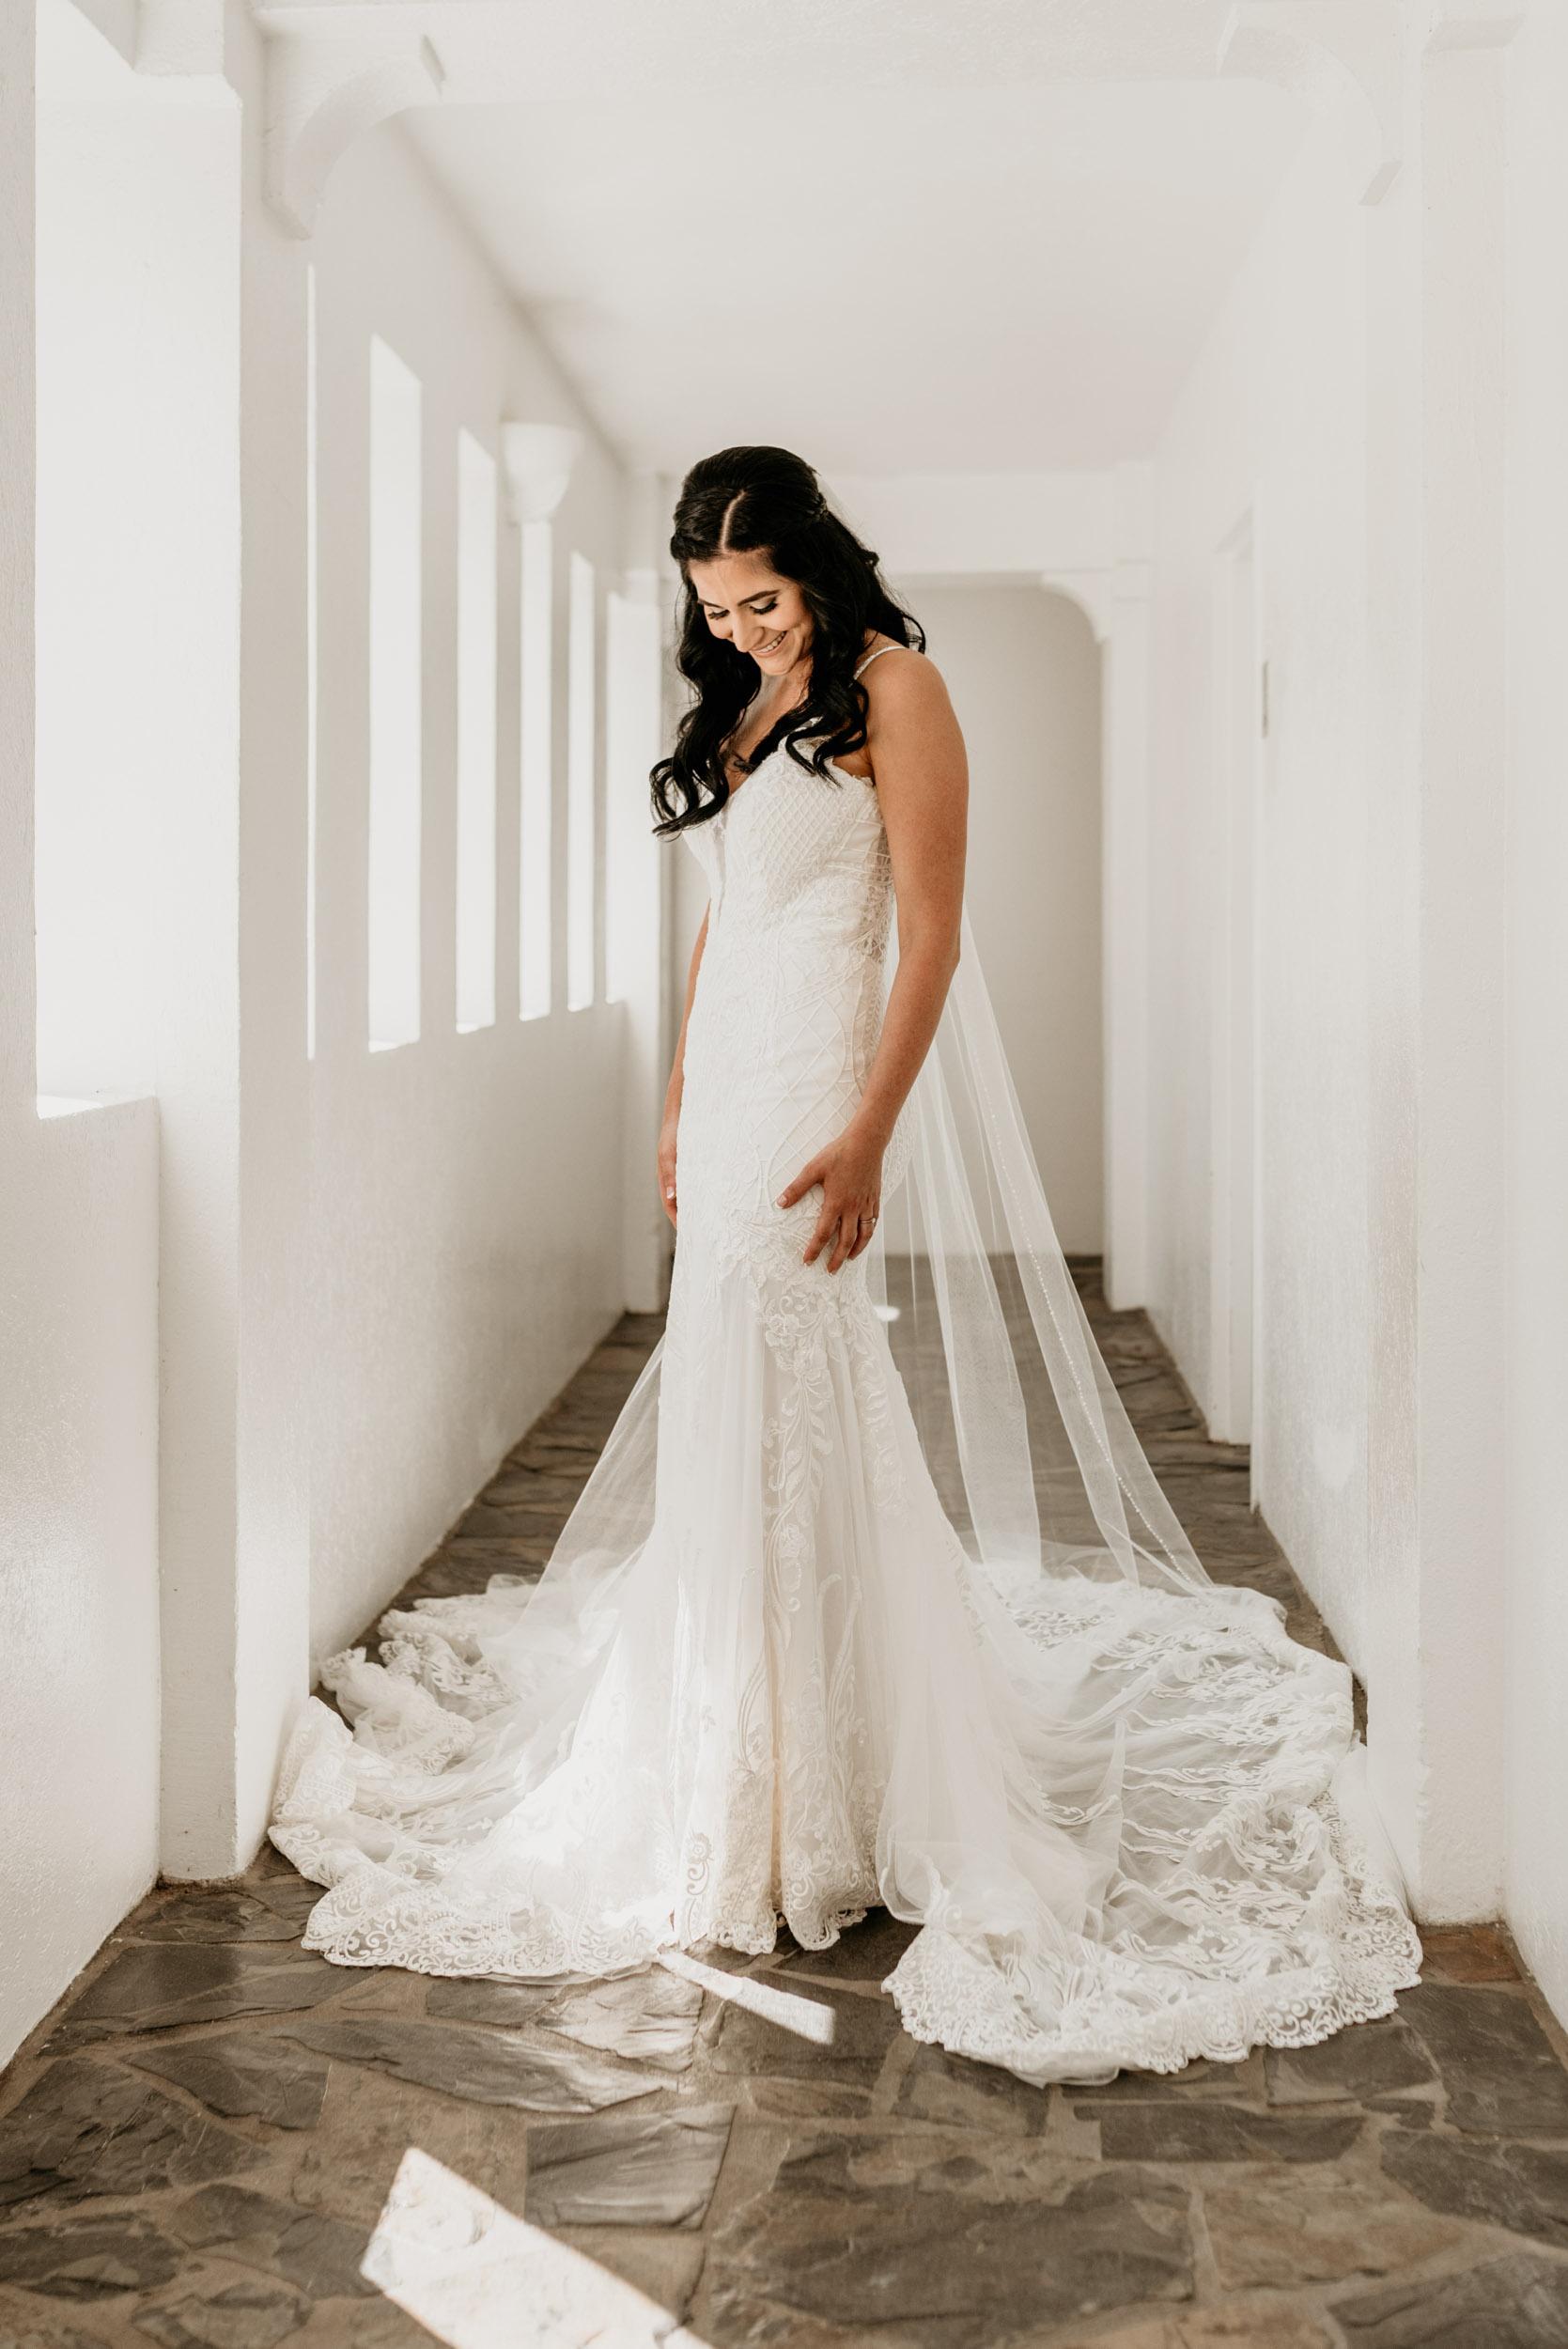 The Raw Photographer - Cairns Wedding Photographer - Beach Palm Cove Ceremony - Dress Irene Costa's Devine Bridal - Queensland-26.jpg